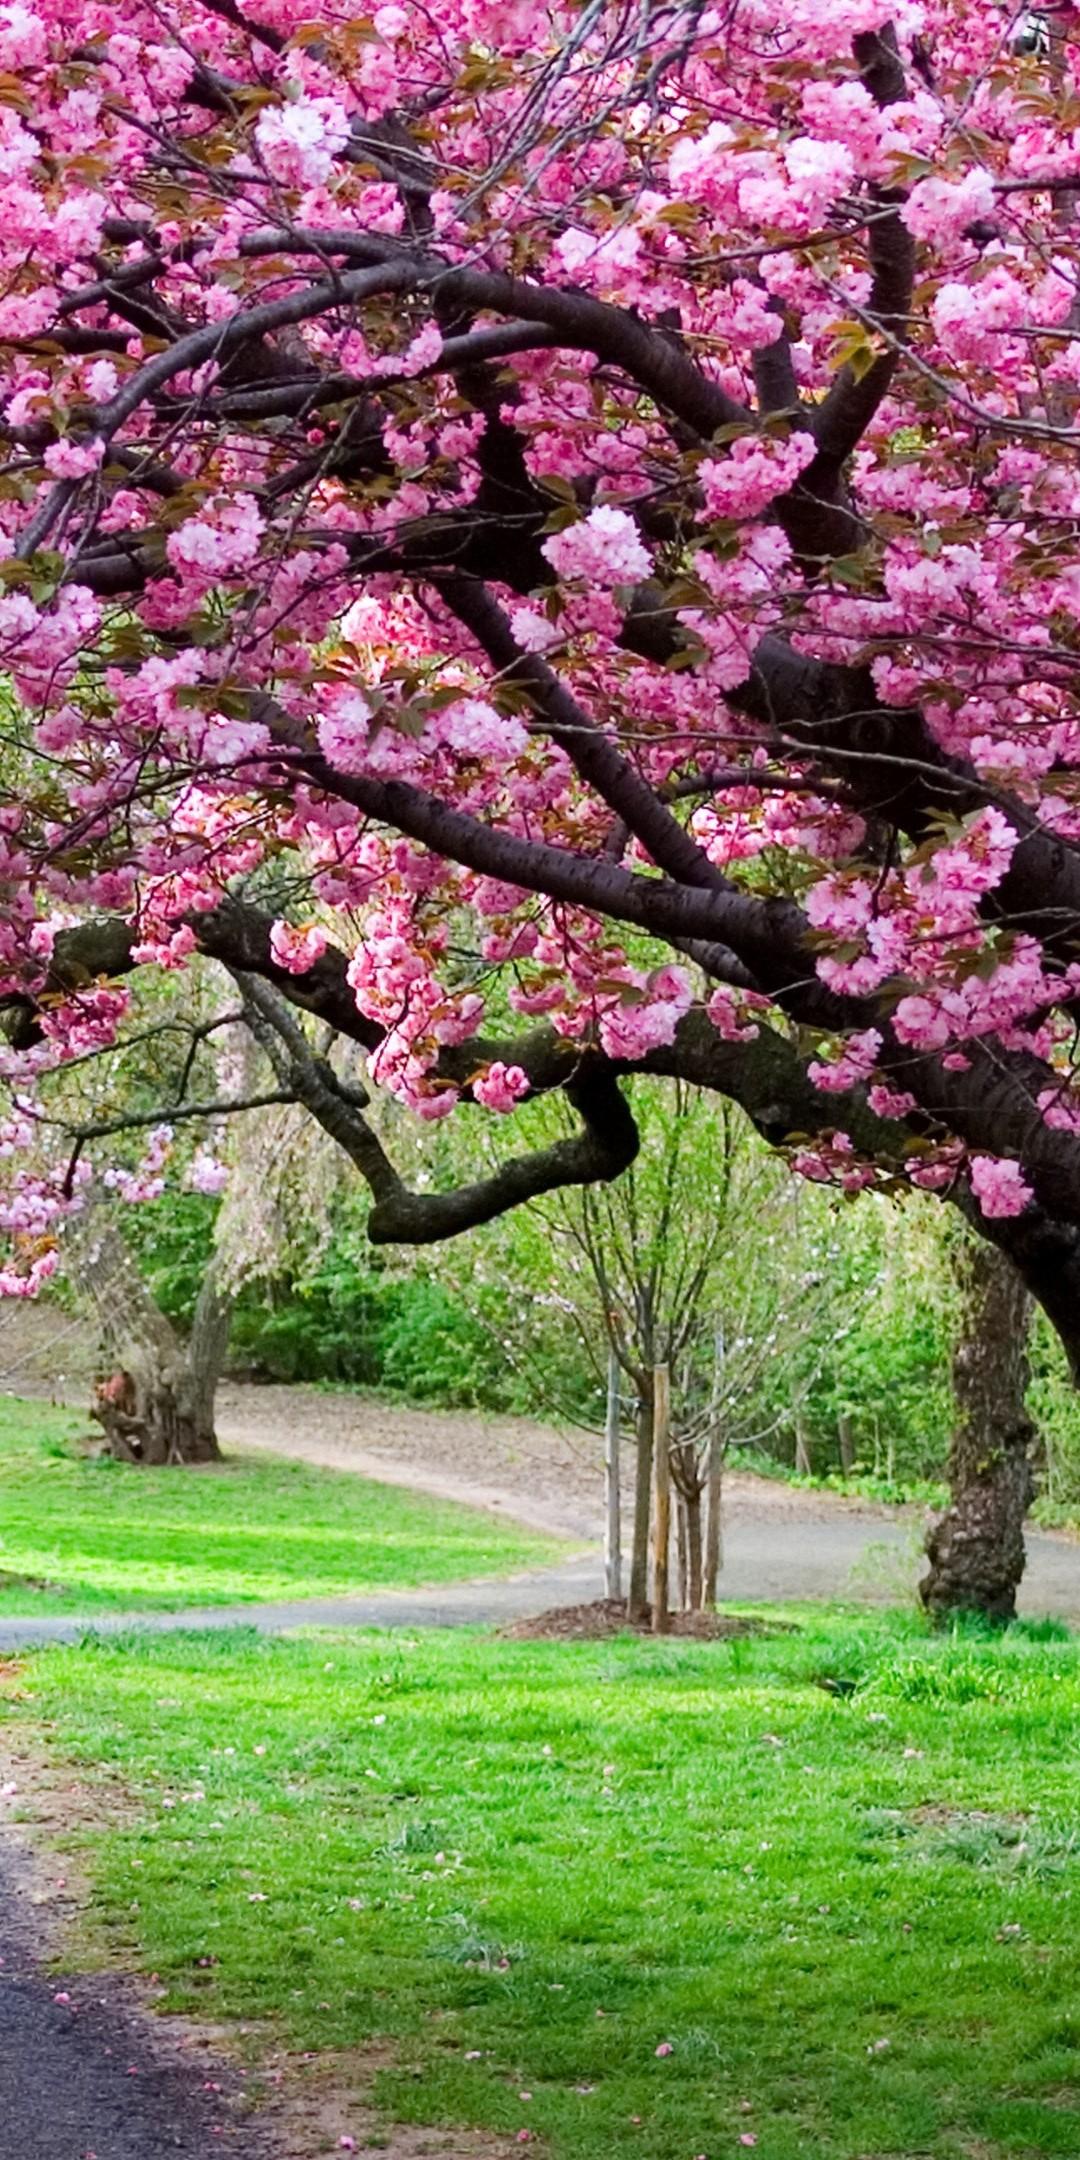 Sakura Ultra Hd Wallpaper Cherry Blossom Wallpaper 4k Phone 1080x2160 Wallpaper Teahub Io